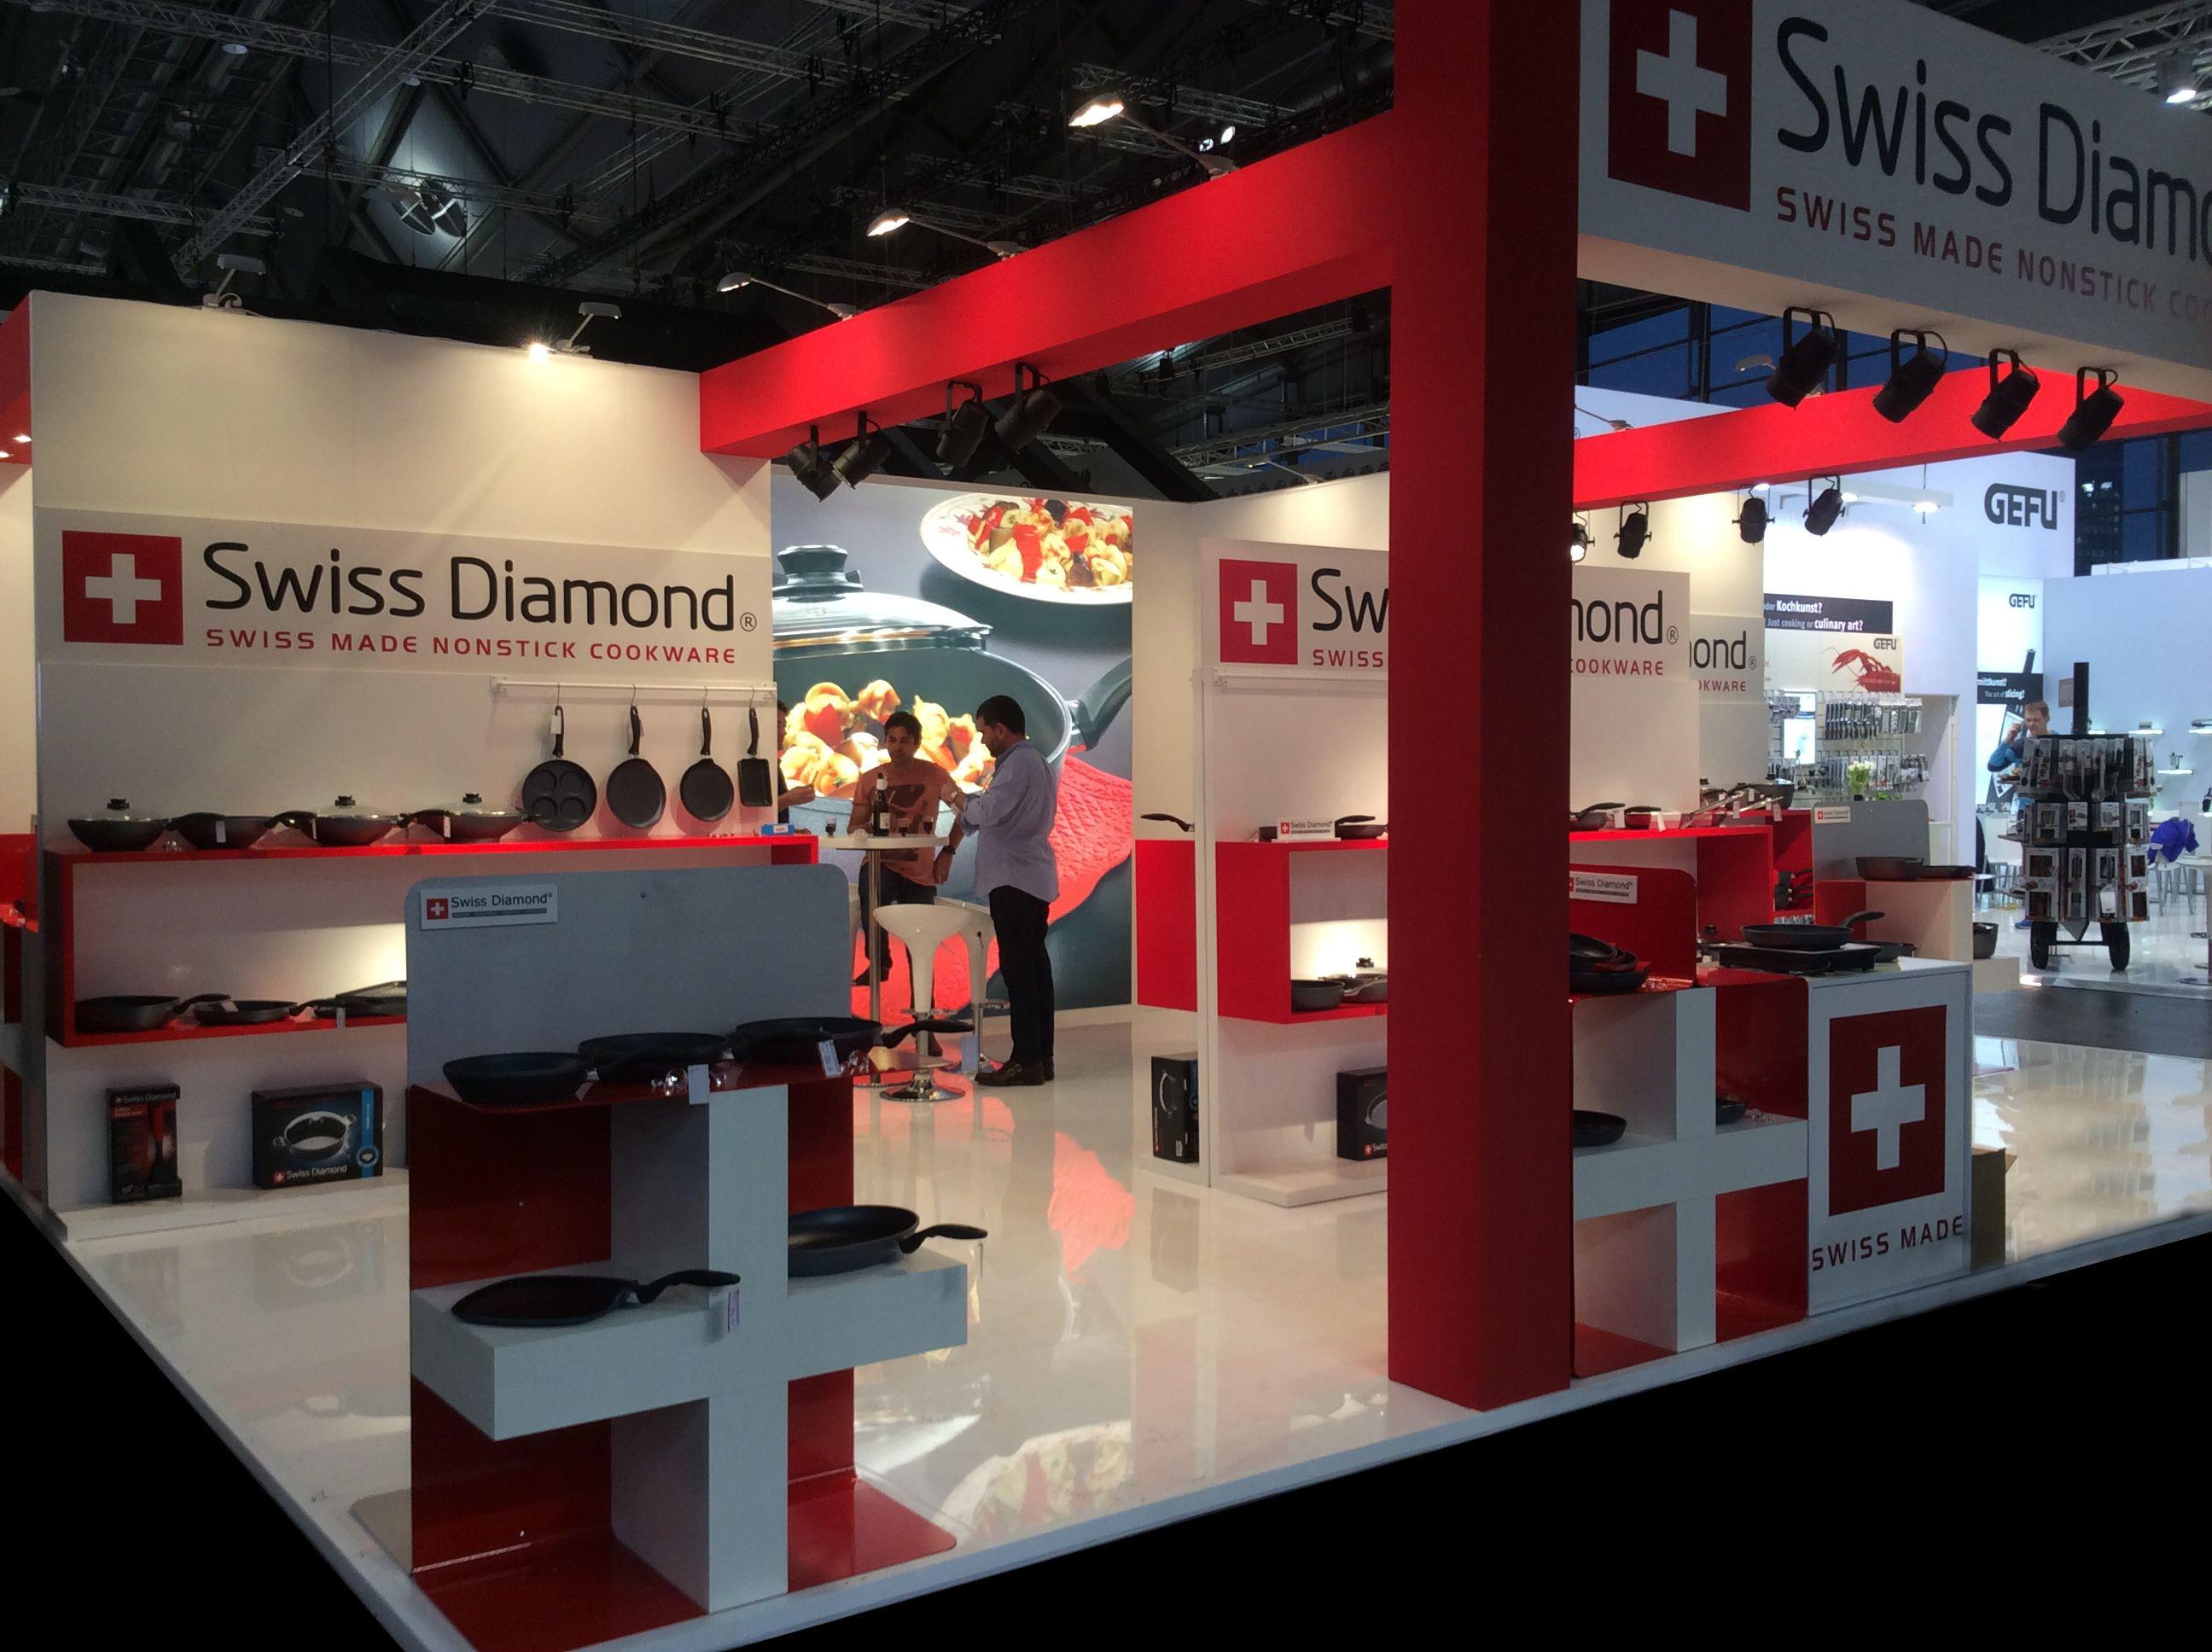 Swiss Diamond alla fiera Ambiente a Francoforte / Swiss Diamond at the Ambiente fair in Frankfurt